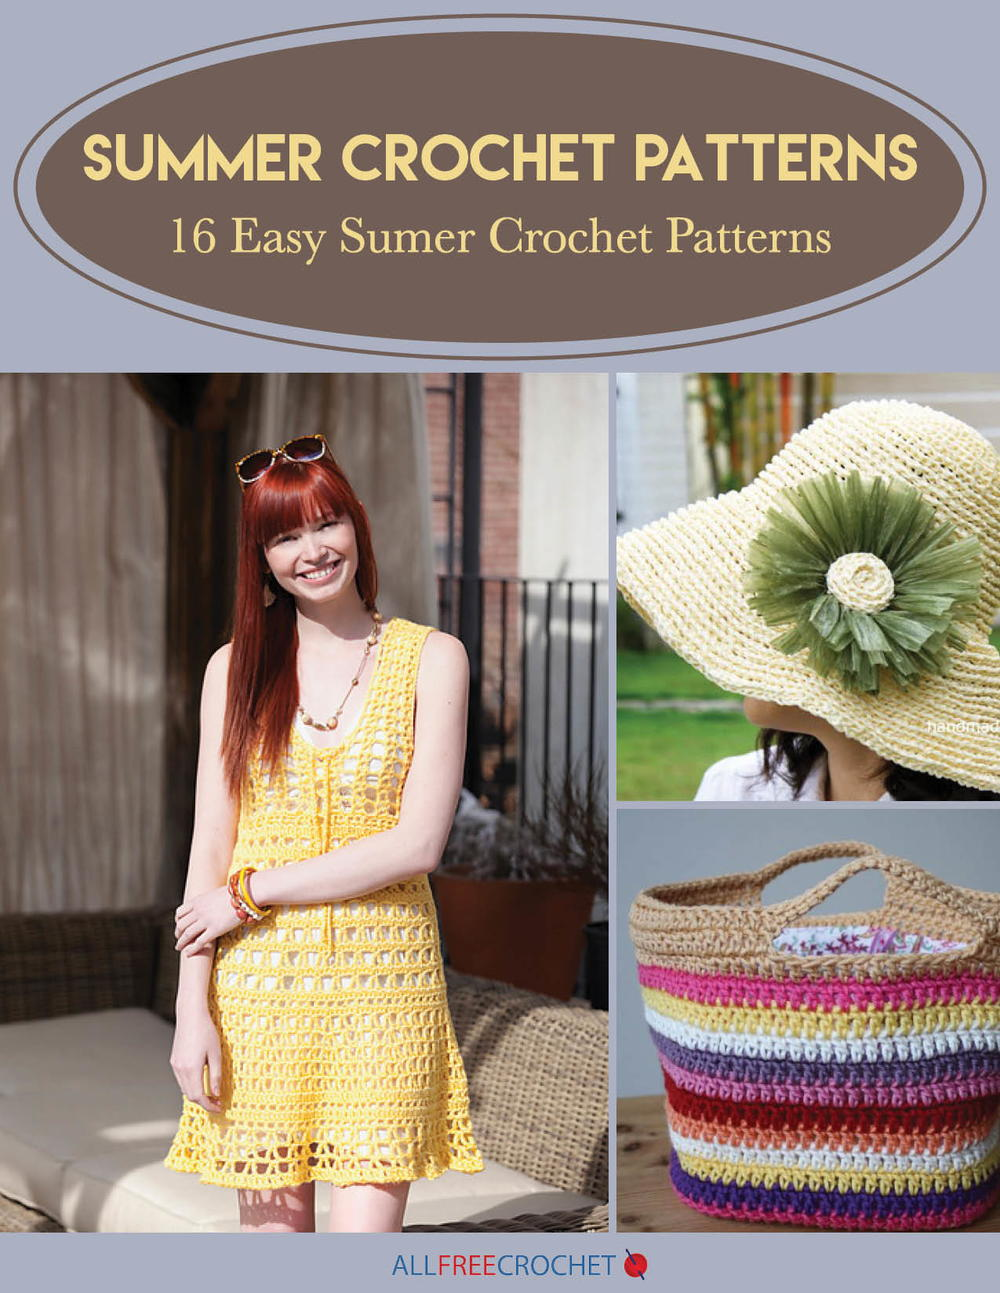 Summer Crochet Patterns : Summer Crochet Patterns: 16 Easy Summer Crochet Patterns ...